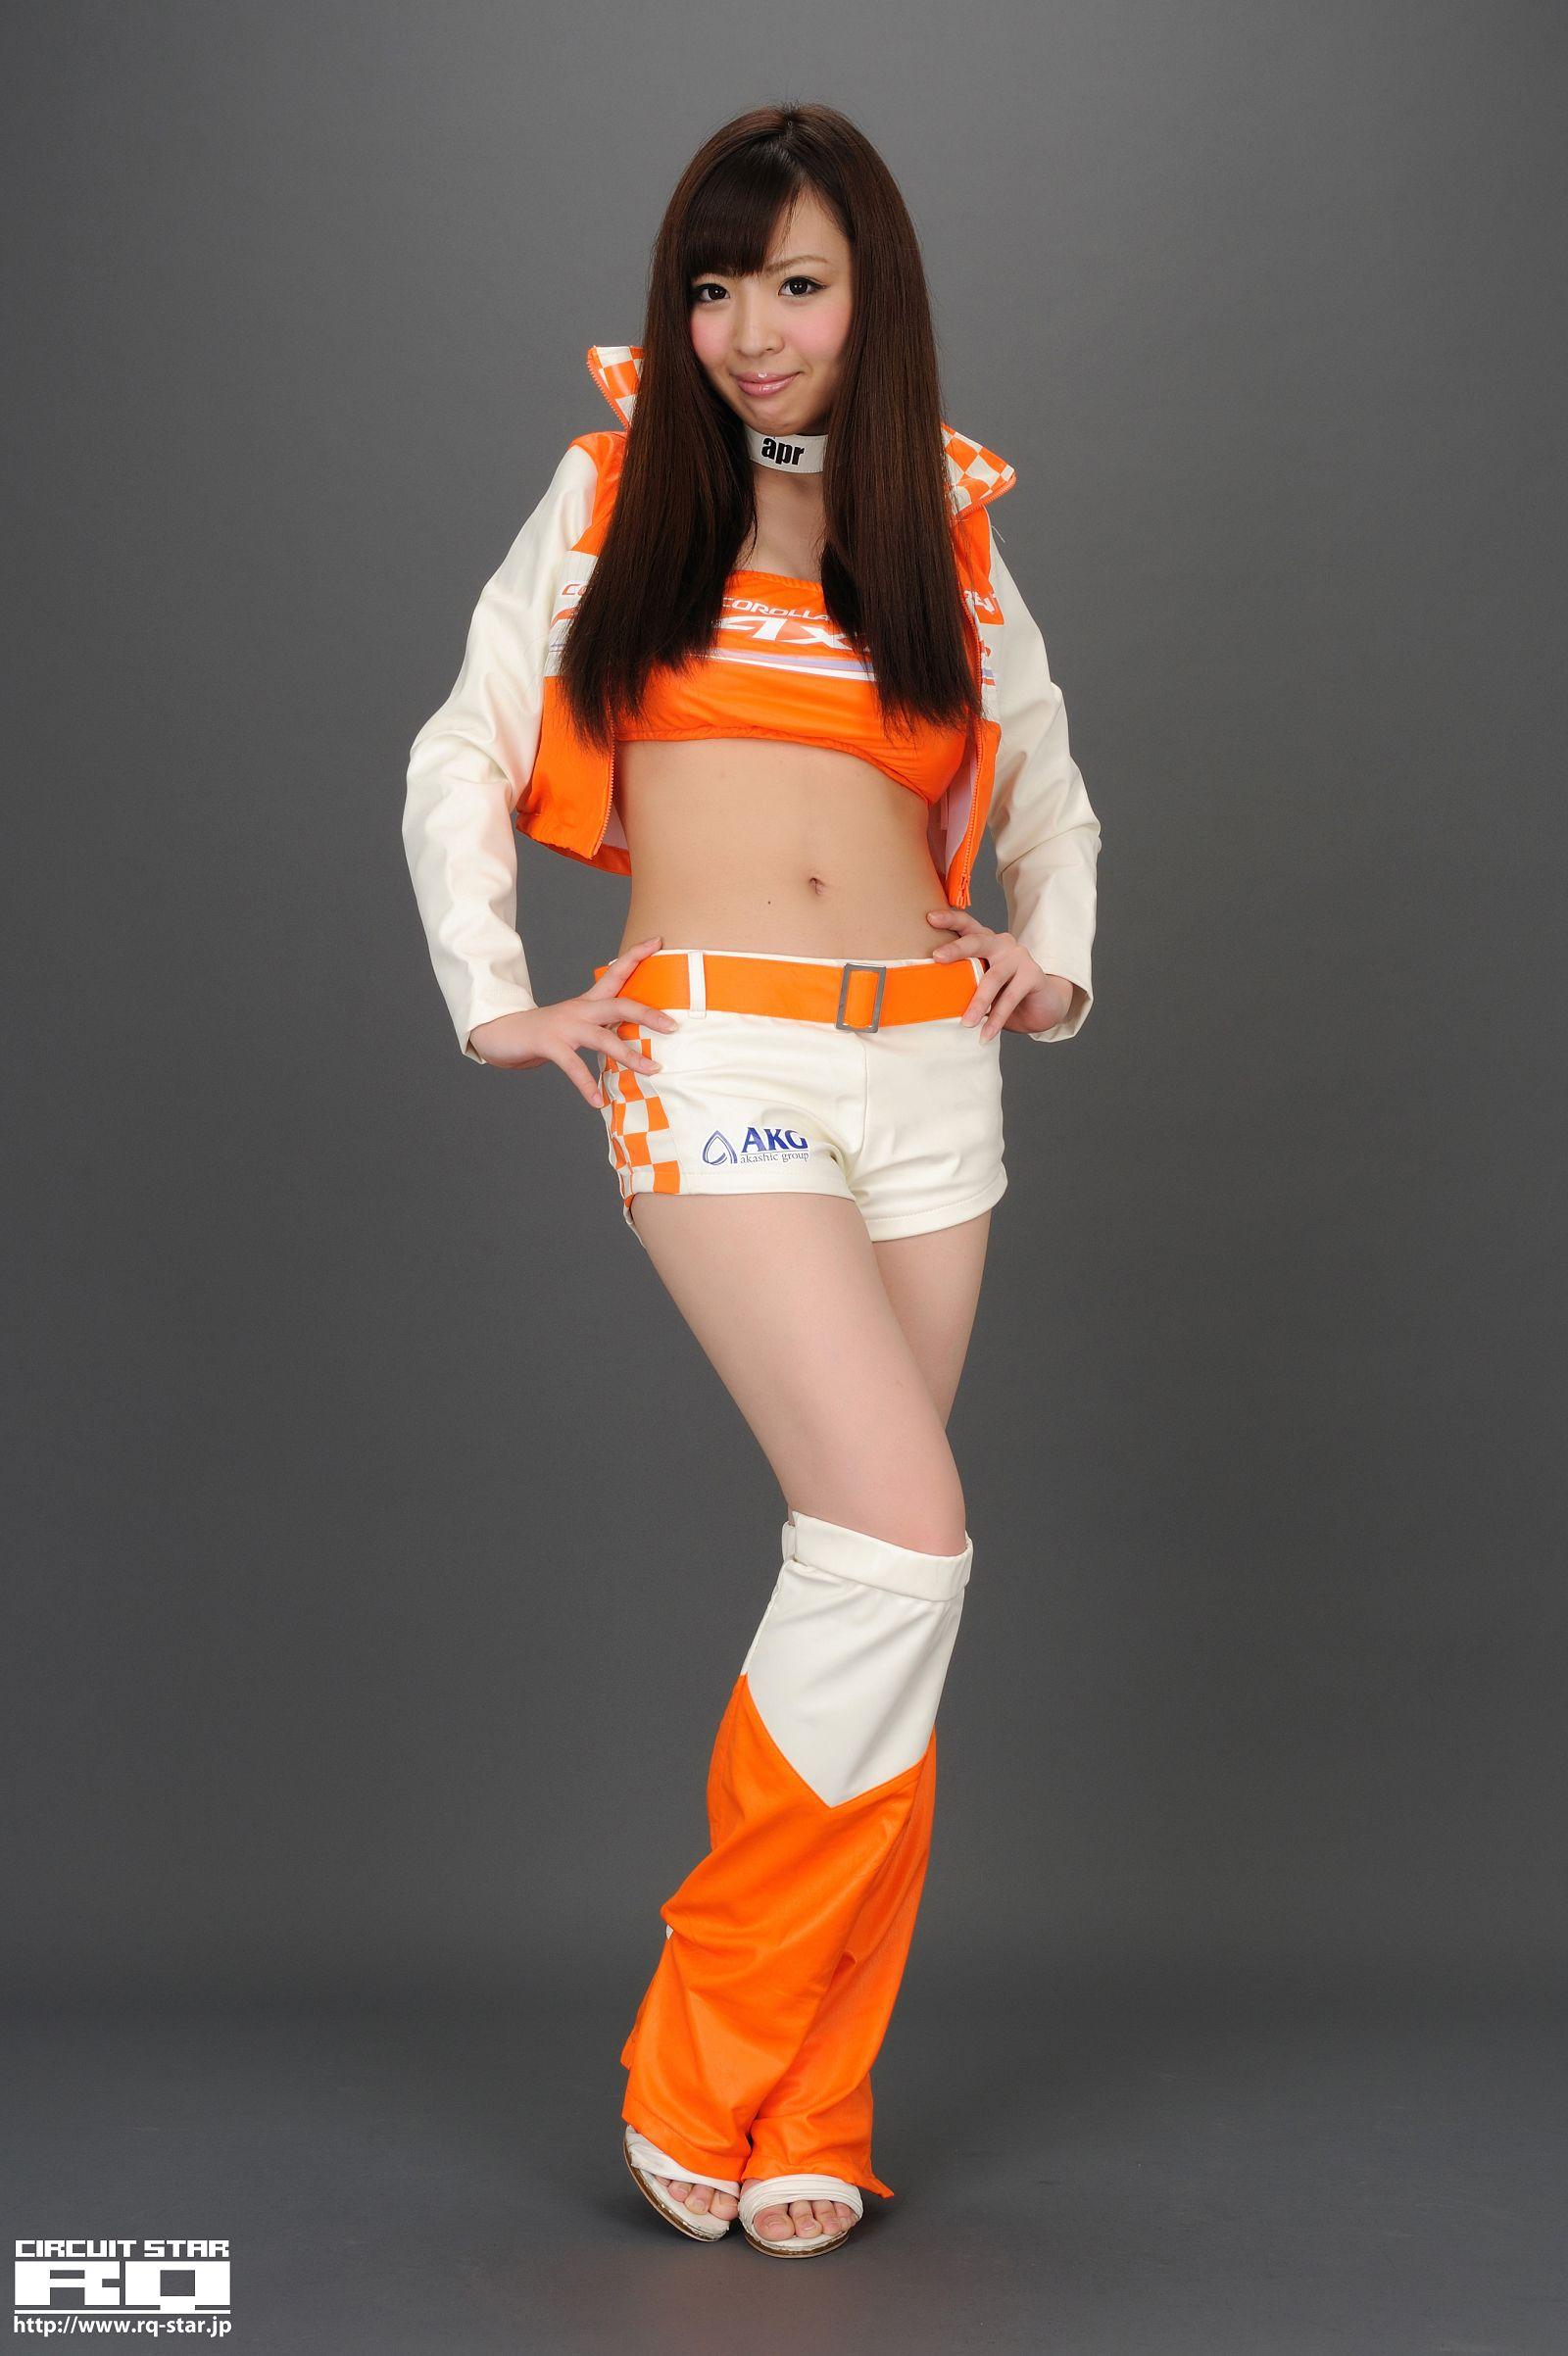 [RQ STAR美女] NO.00521 Mayuka Kuroda 锿蚪Y花 Race Queen[150P] RQ STAR 第1张